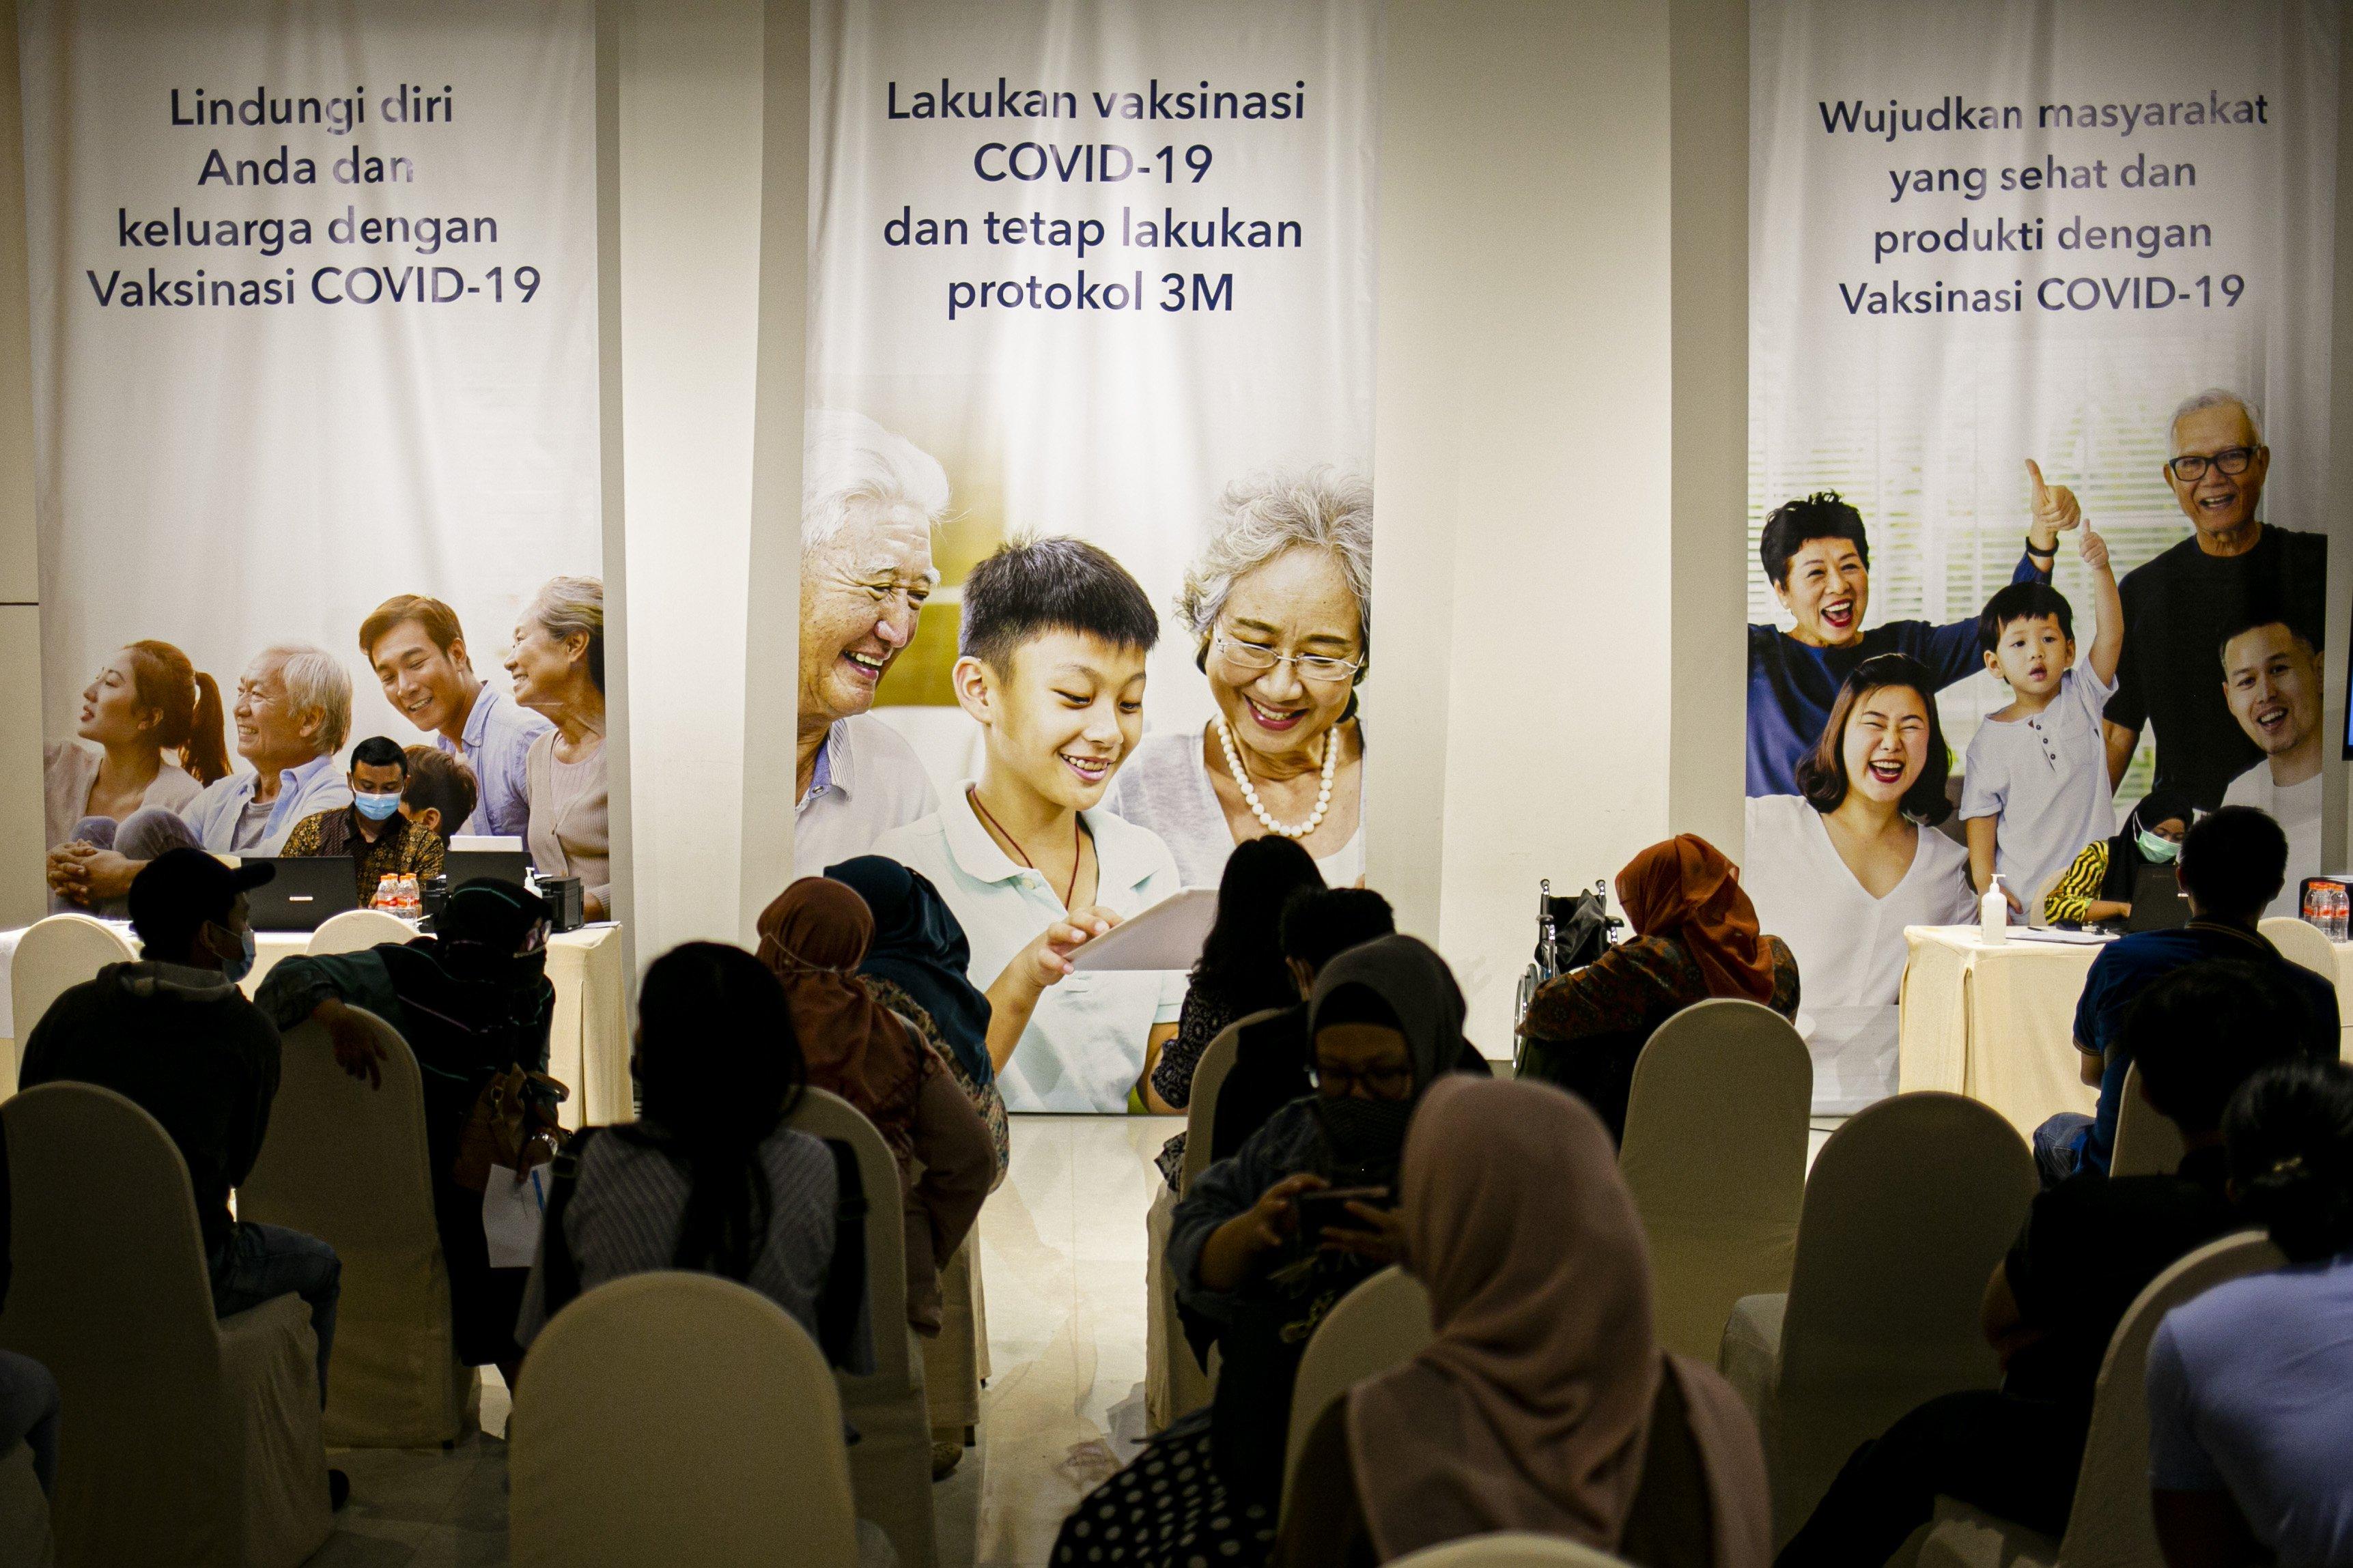 Sejumlah pelaku Usaha Mikro Kecil Menengah (UMKM) menunggu giliran vaksinasi covid-19 di Ciputra Artpreneur, Jakarta Selatan, Kamis (1/4/2021). Kementerian Koperasi dan Usaha Kecil dan Menengah menyelenggarakan vaksinasi COVID-19 massal bagi 1.500 pelaku Usaha mikro kecil menengah (UMKM) di DKI Jakarta dengan target vaksinasi untuk pelaku UMKM tersebut mencapai 250.000 orang.